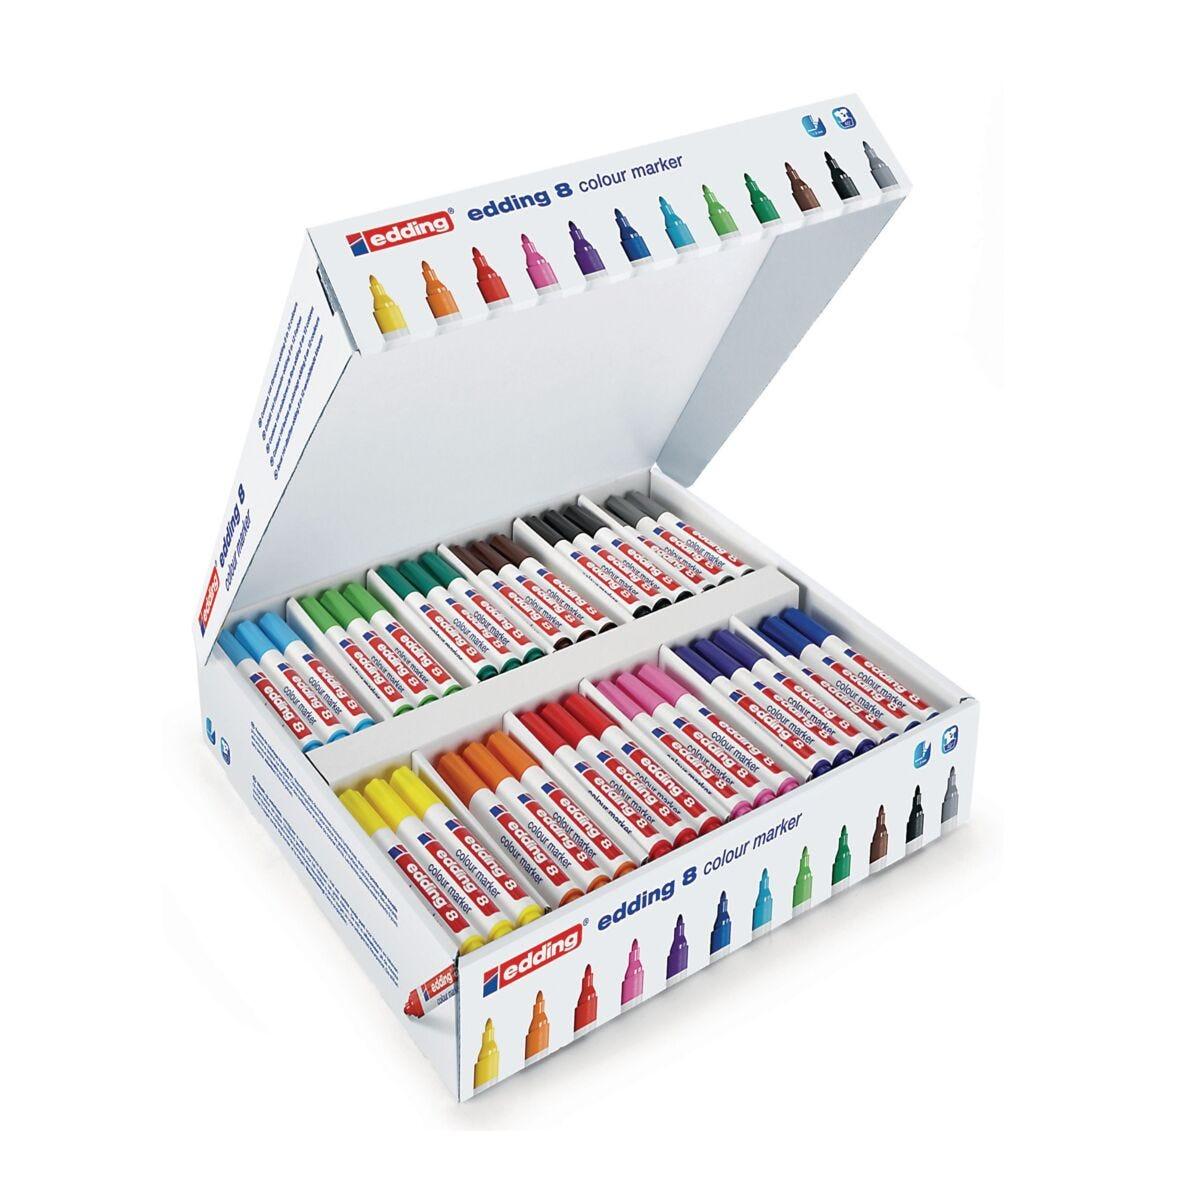 Edding Colourmarkers Bullet Classpack of 144 Pens